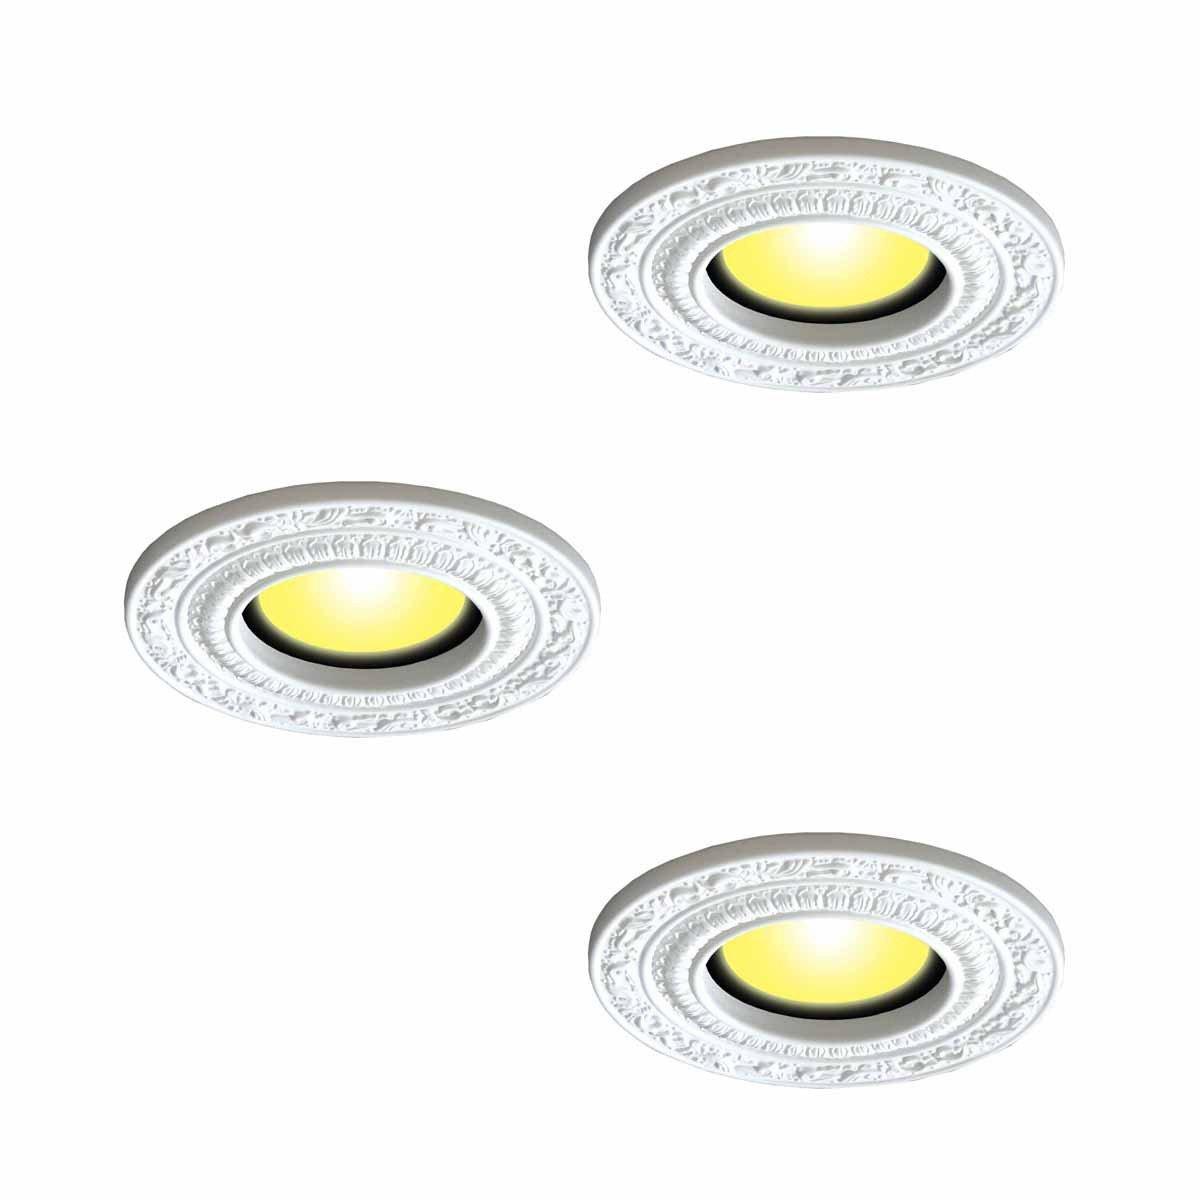 3 Spot Light Trim Medallions 6'' ID White Urethane Set Of 3